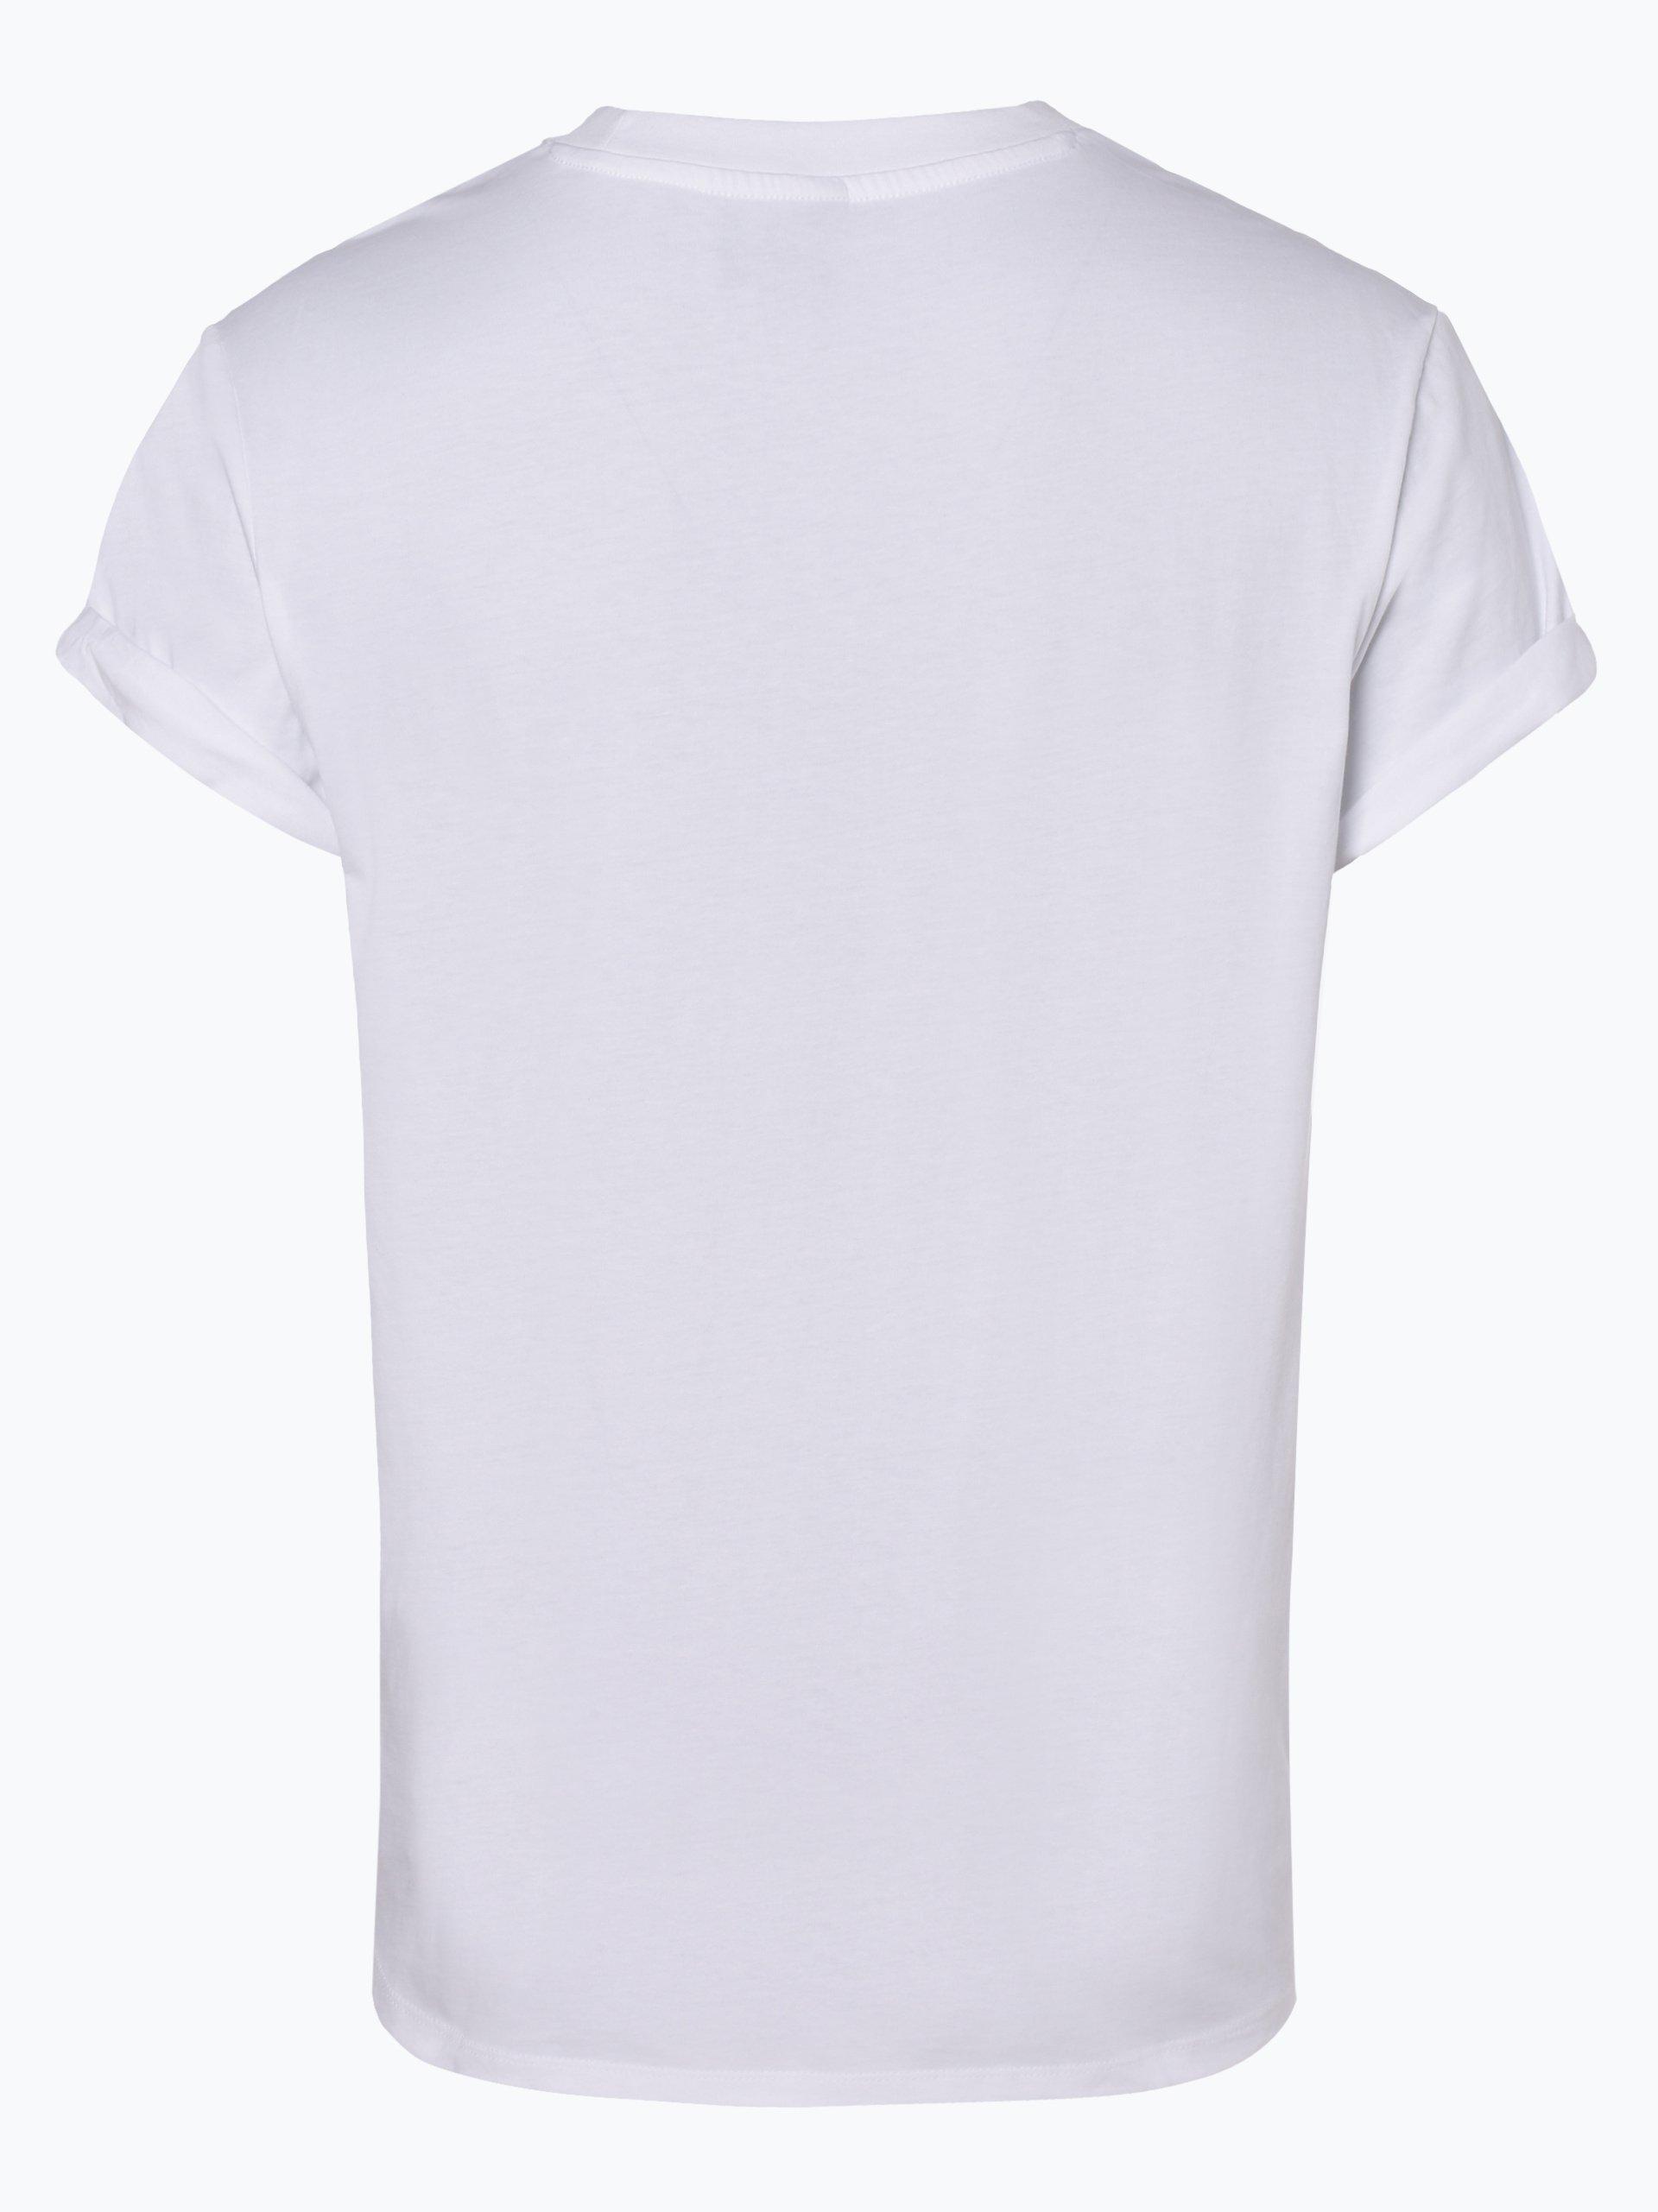 G-Star RAW T-shirt męski – Shelo